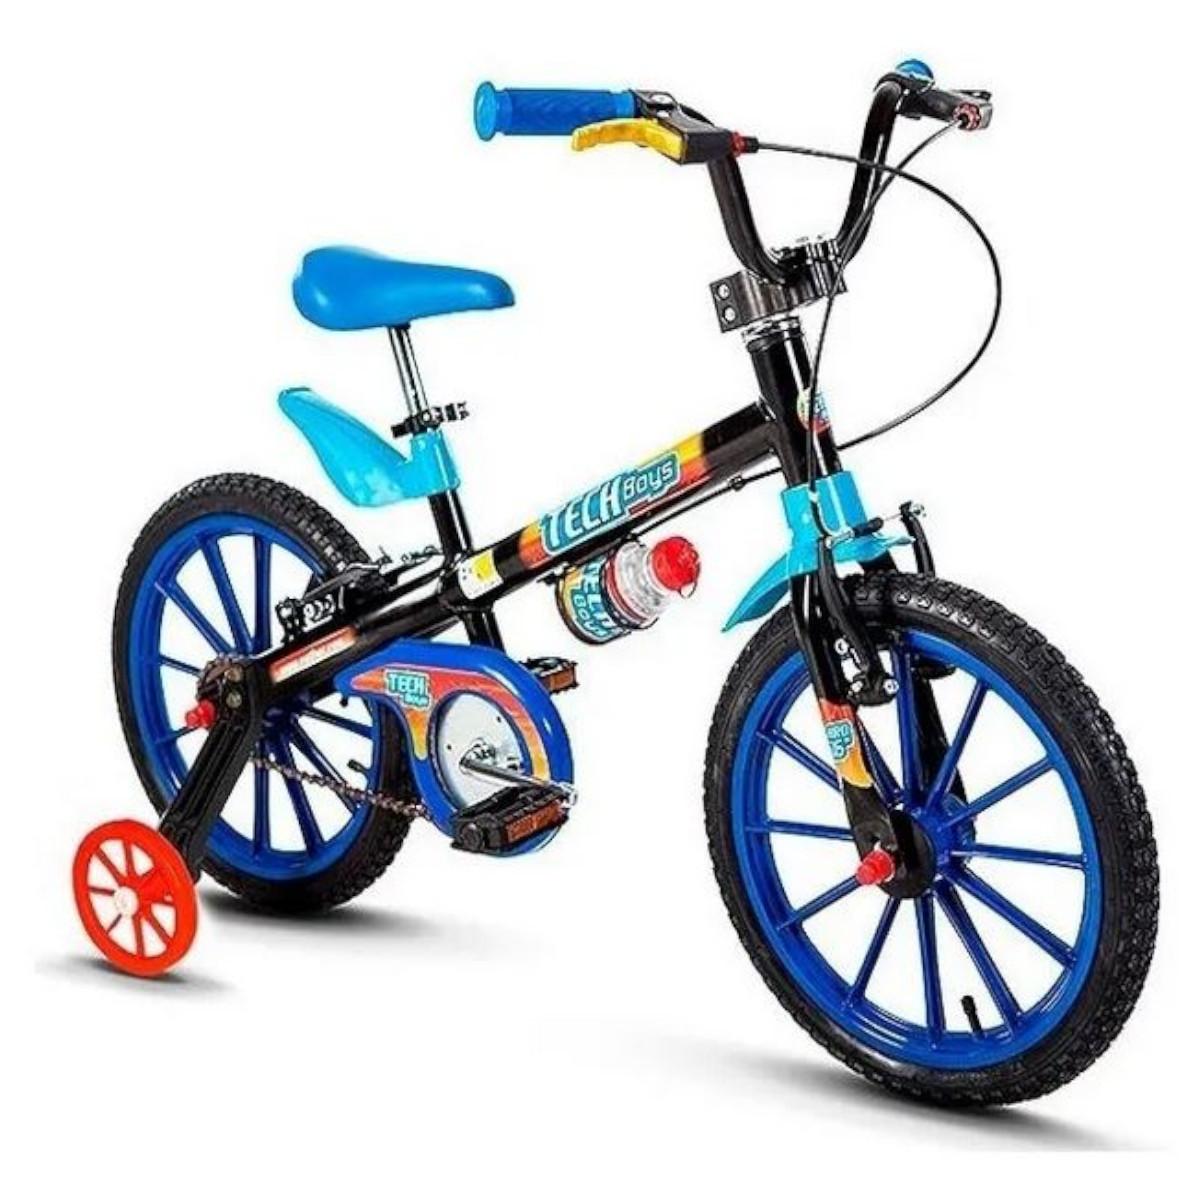 Bicicleta Infantil Nathor Aro16 Azul Tech Boys 5 A 8 Anos